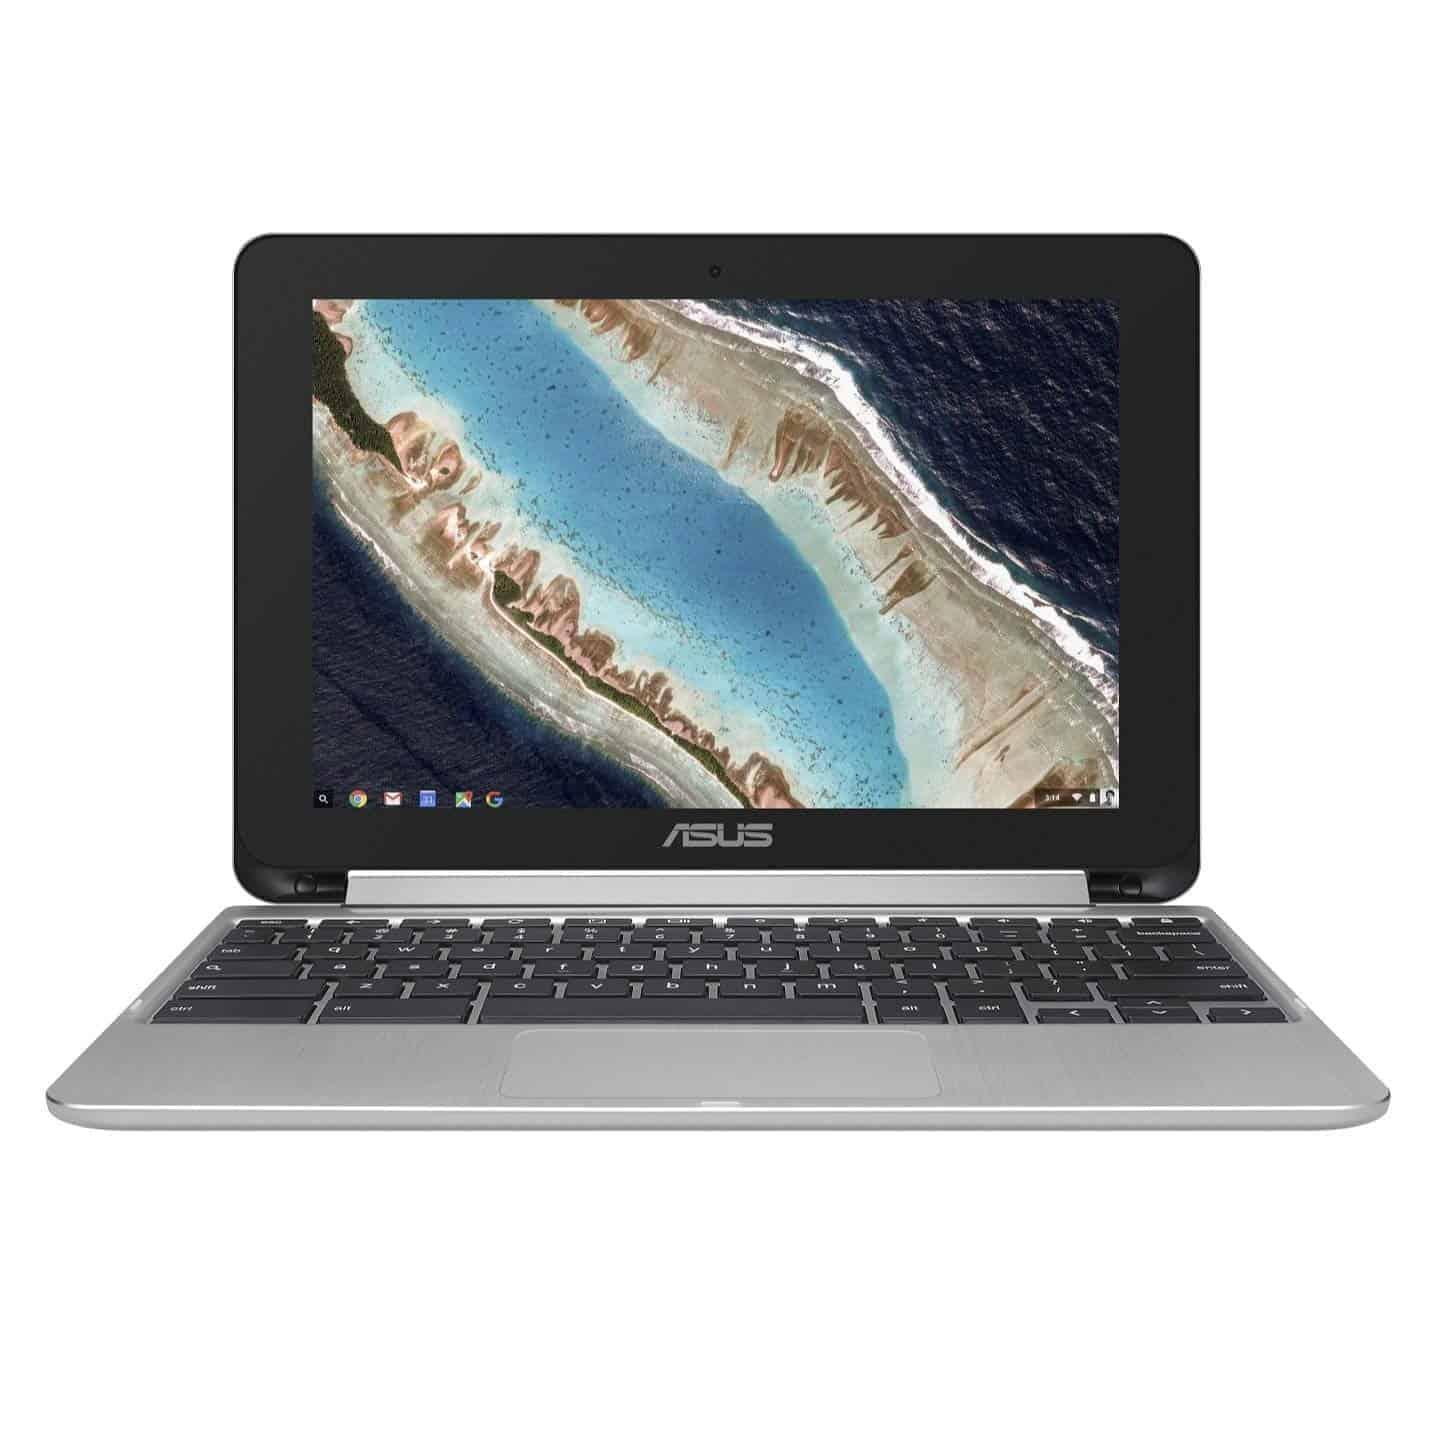 ASUS Chromebook Flip C101PA-DB02 - (Amazon)